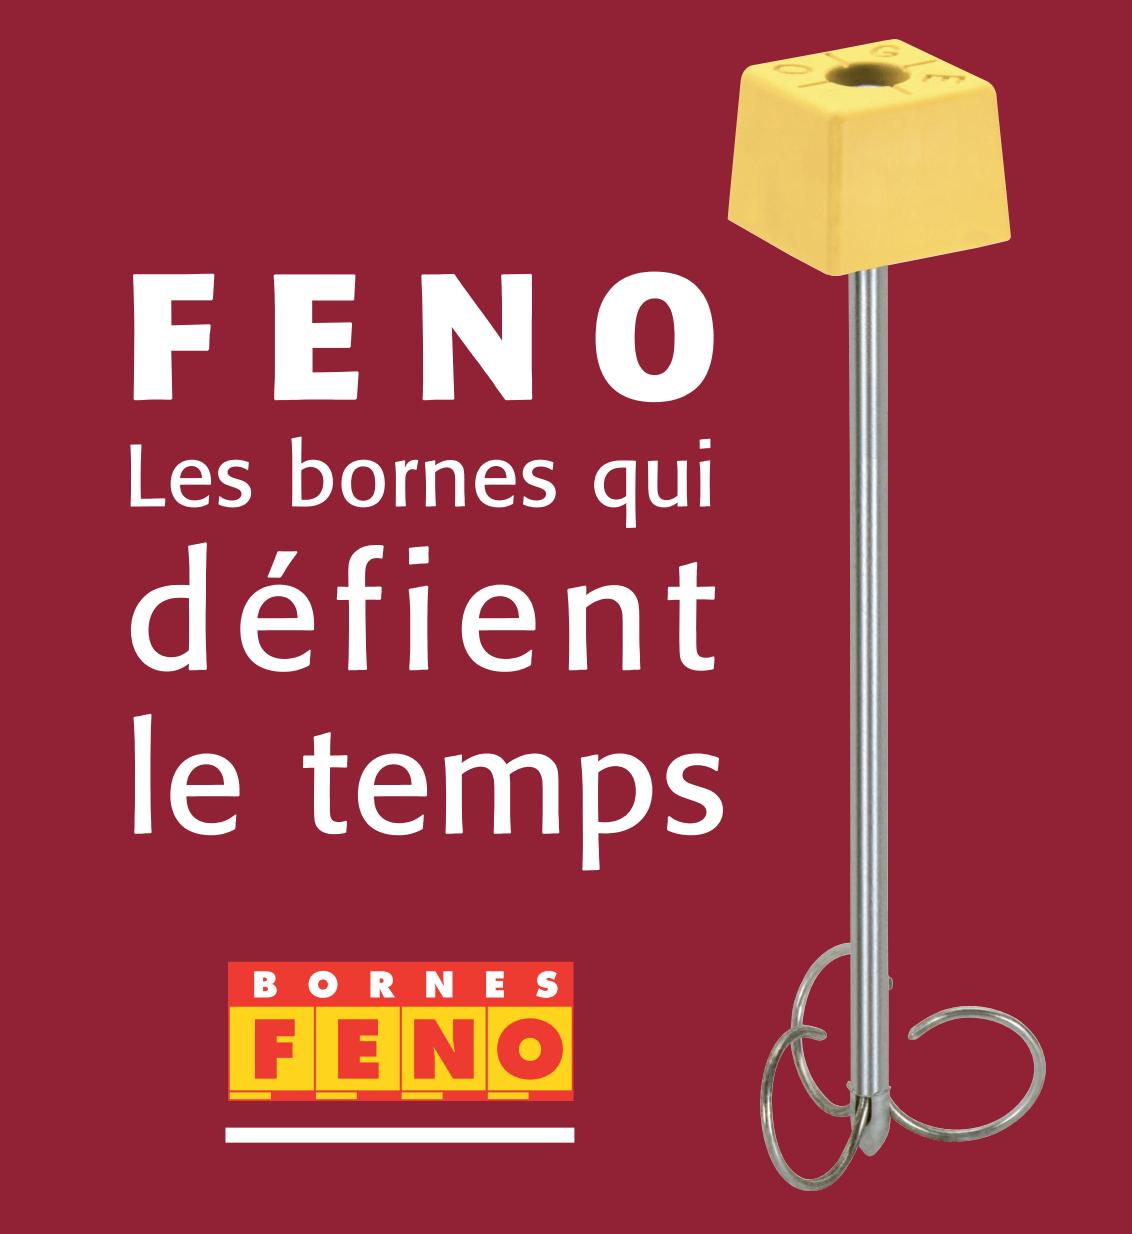 Produits Bornes FENO